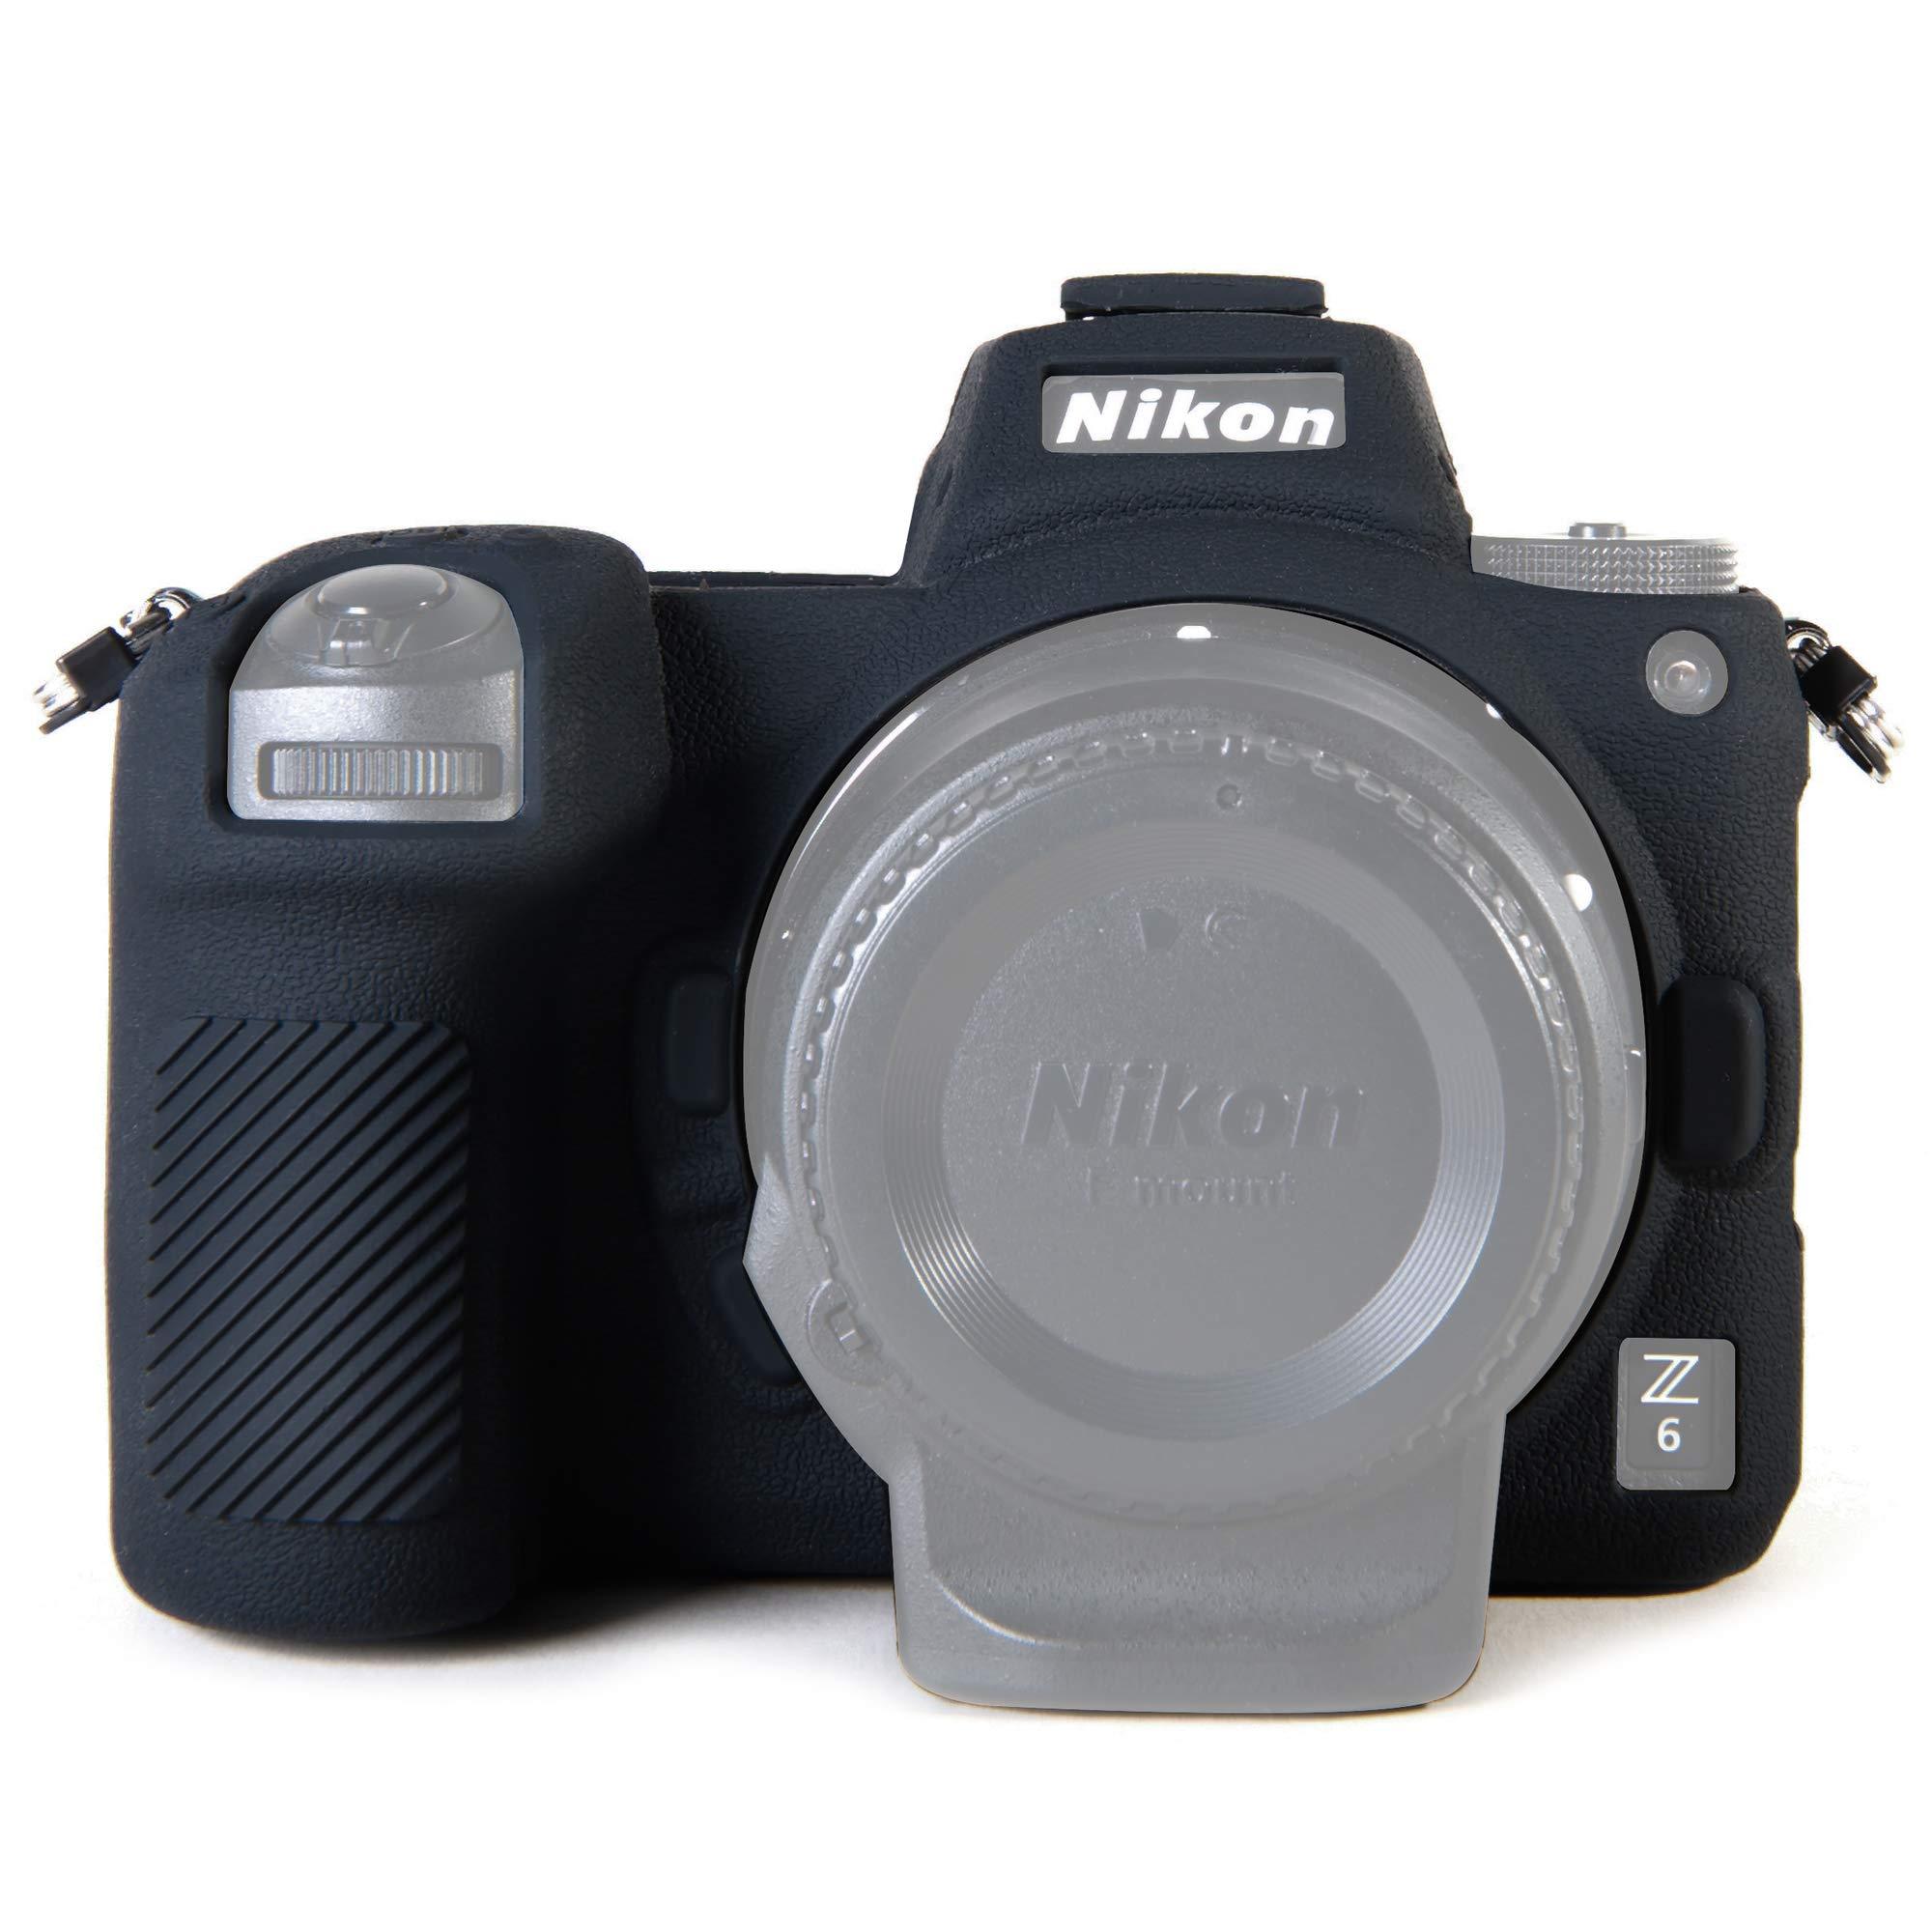 STSEETOP Nikon Z6 Z7 Camera Case, Professional Silicone Rubber Camera Case Cover Detachable Protective Case for Nikon Z6 Z7 (Black) by STSEETOP